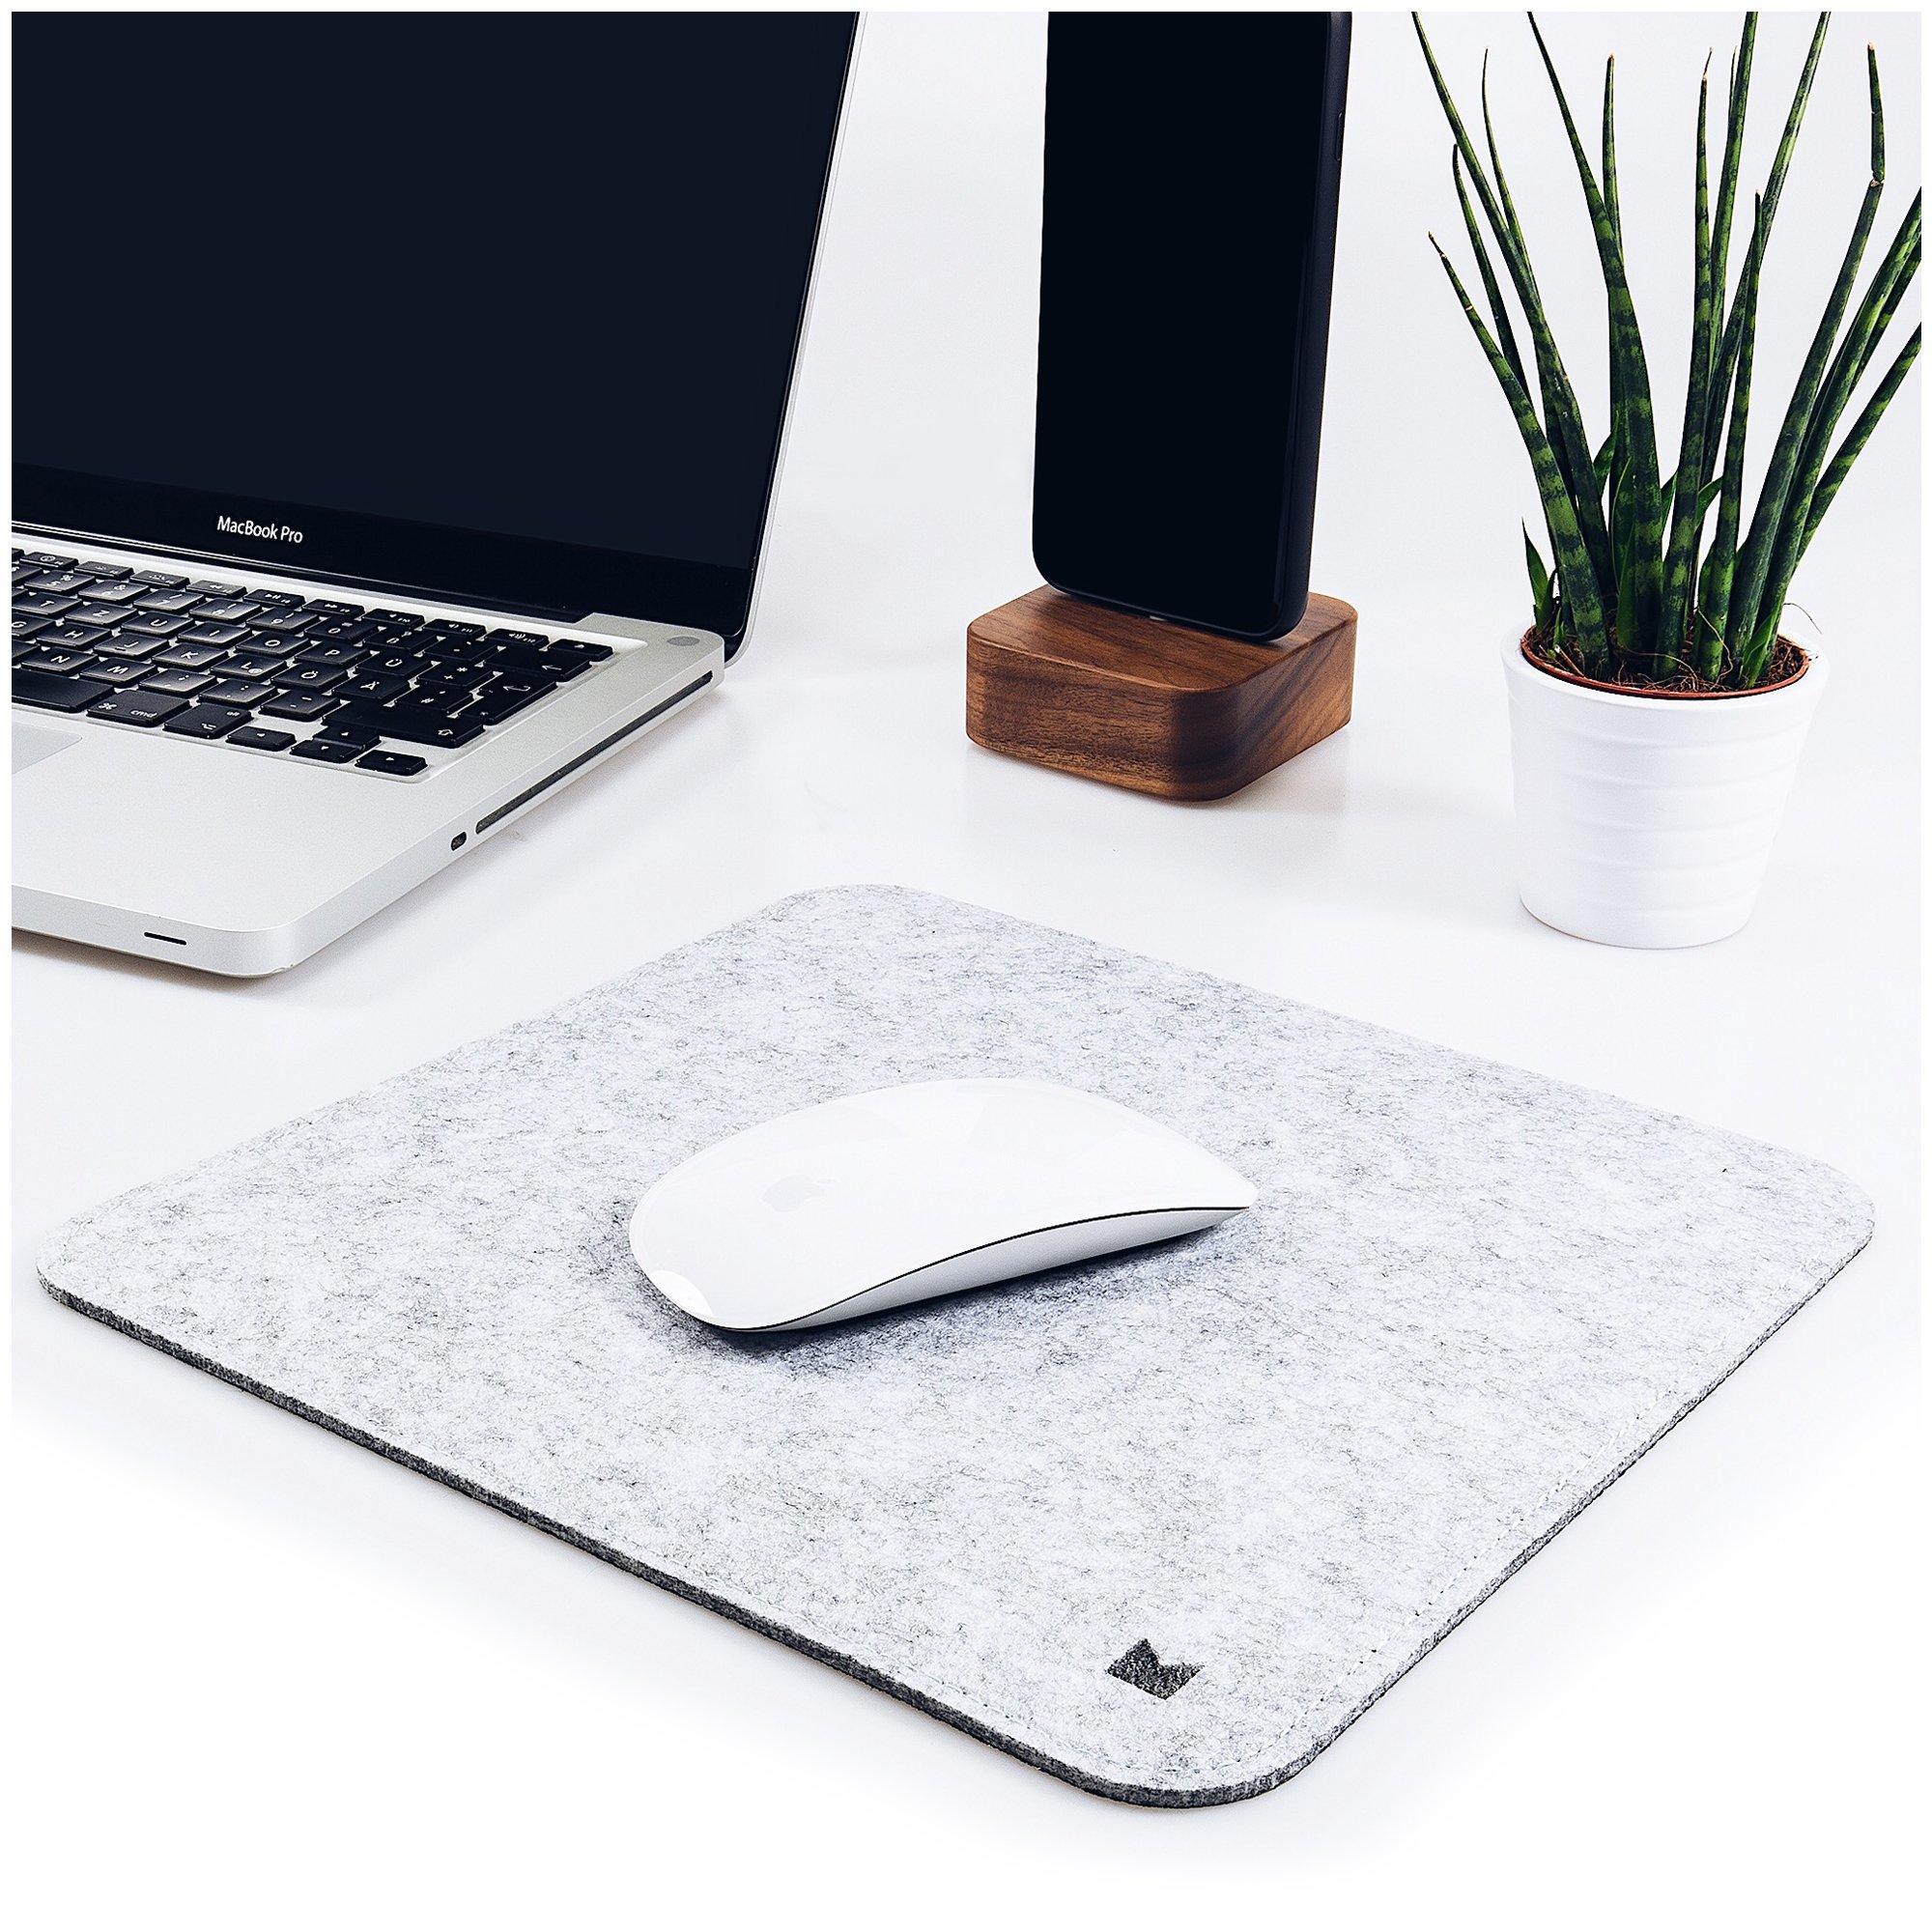 FORMGUT® // Mousepad, Untersetzer aus Filz, Mausunterlage, Mauspad, Gaming, Designer, Schreibtisch Pads, Laptop Zubehör, Apple Mouse Filzpad mit Antirutsch Beschichtung // Hellgrau